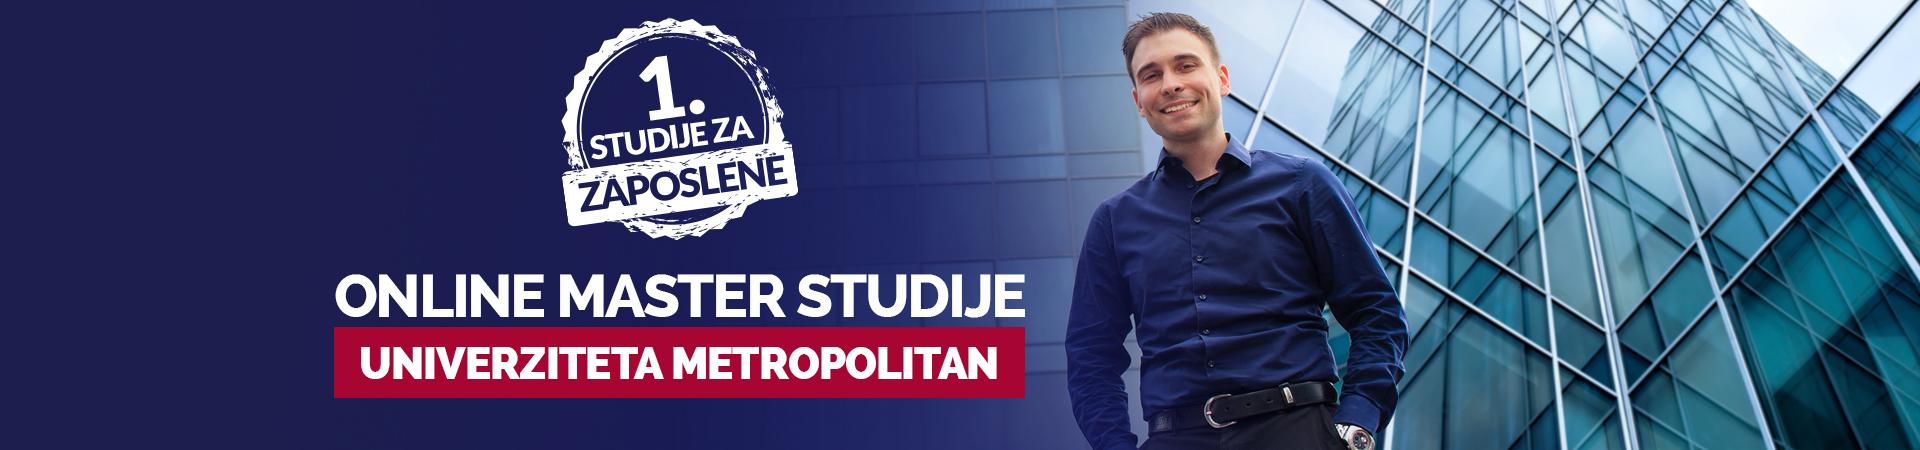 Master studije - Univerzitet Metropolitan